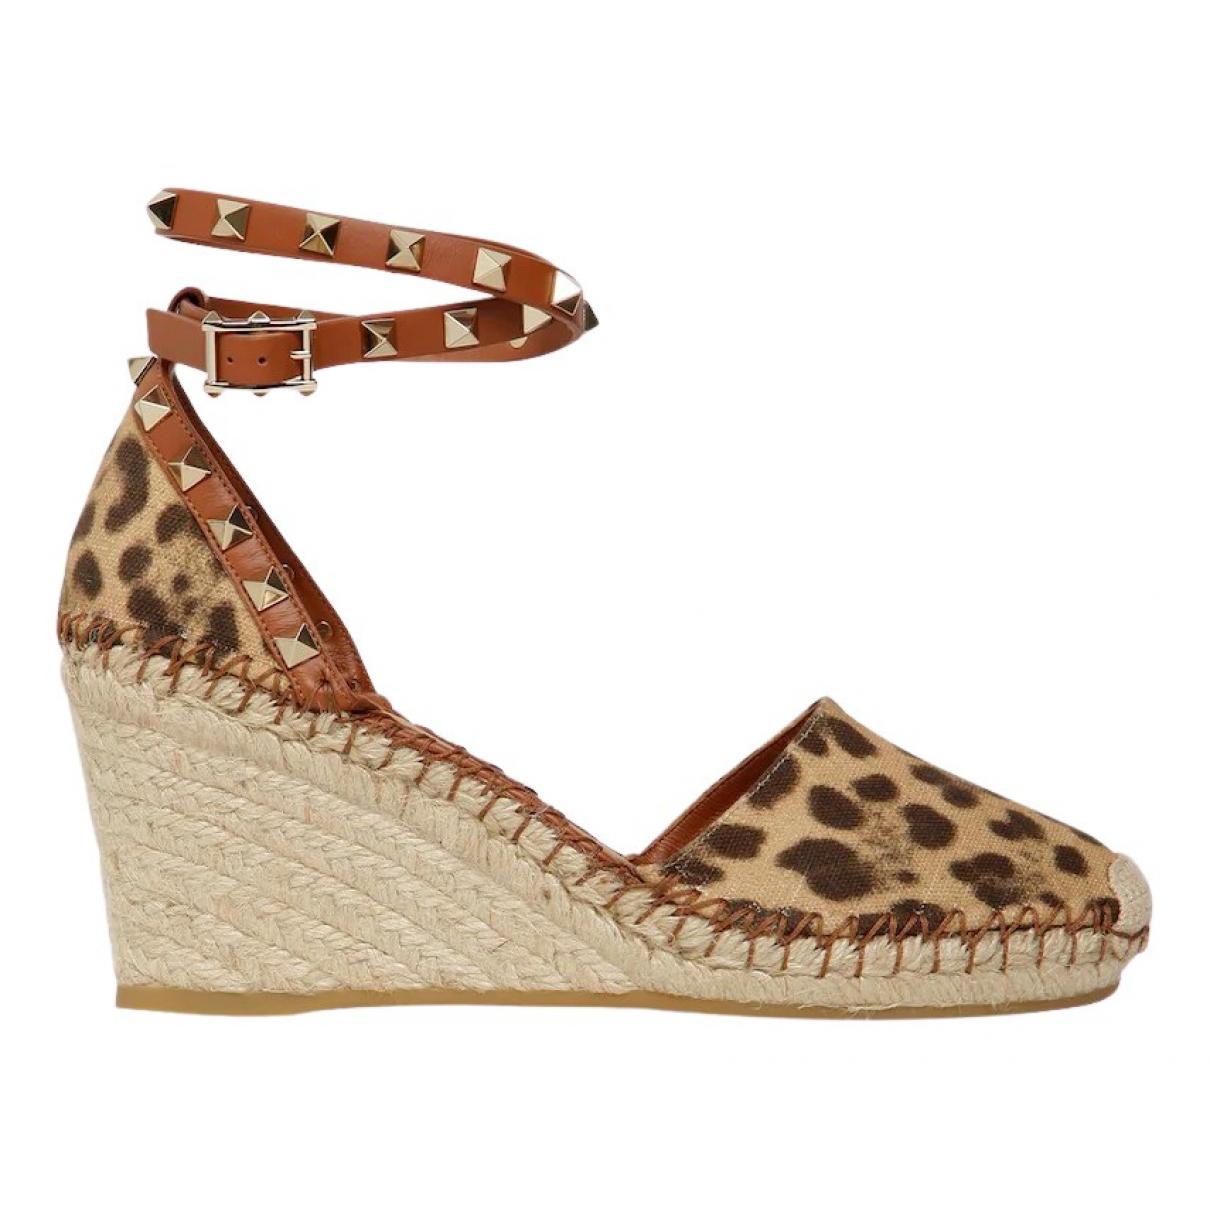 Valentino Garavani Rockstud Multicolour Leather Sandals for Women 35 EU